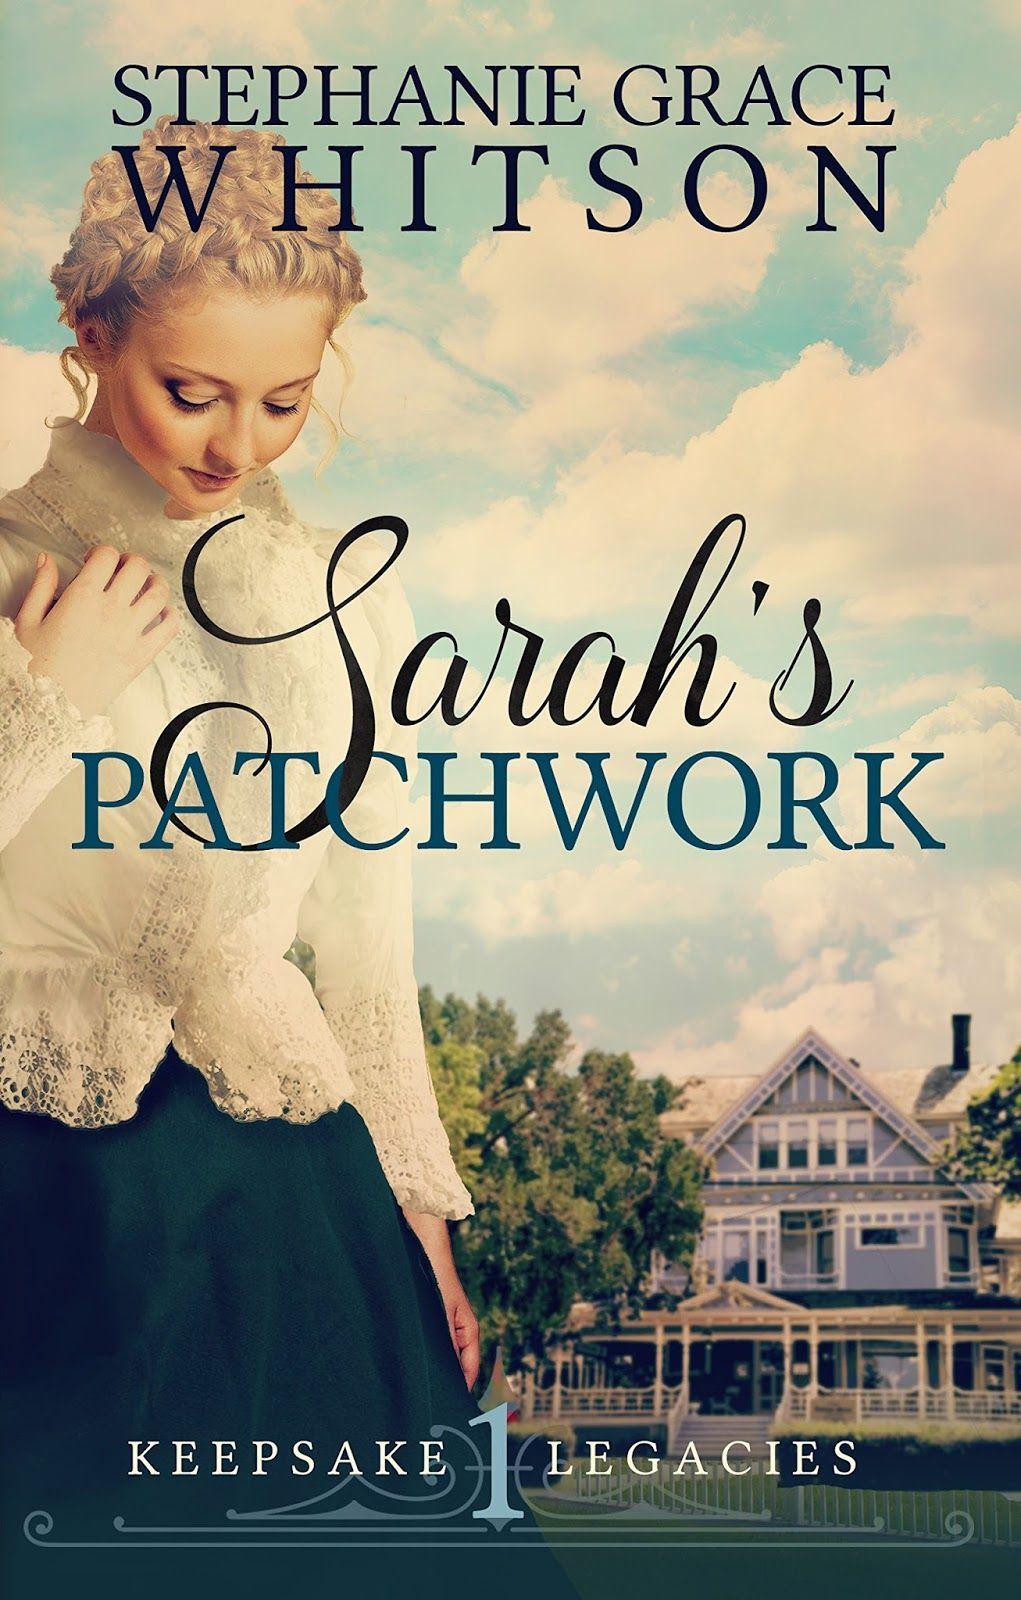 Sarahs Patchwork By Stephanie Grace Whitson